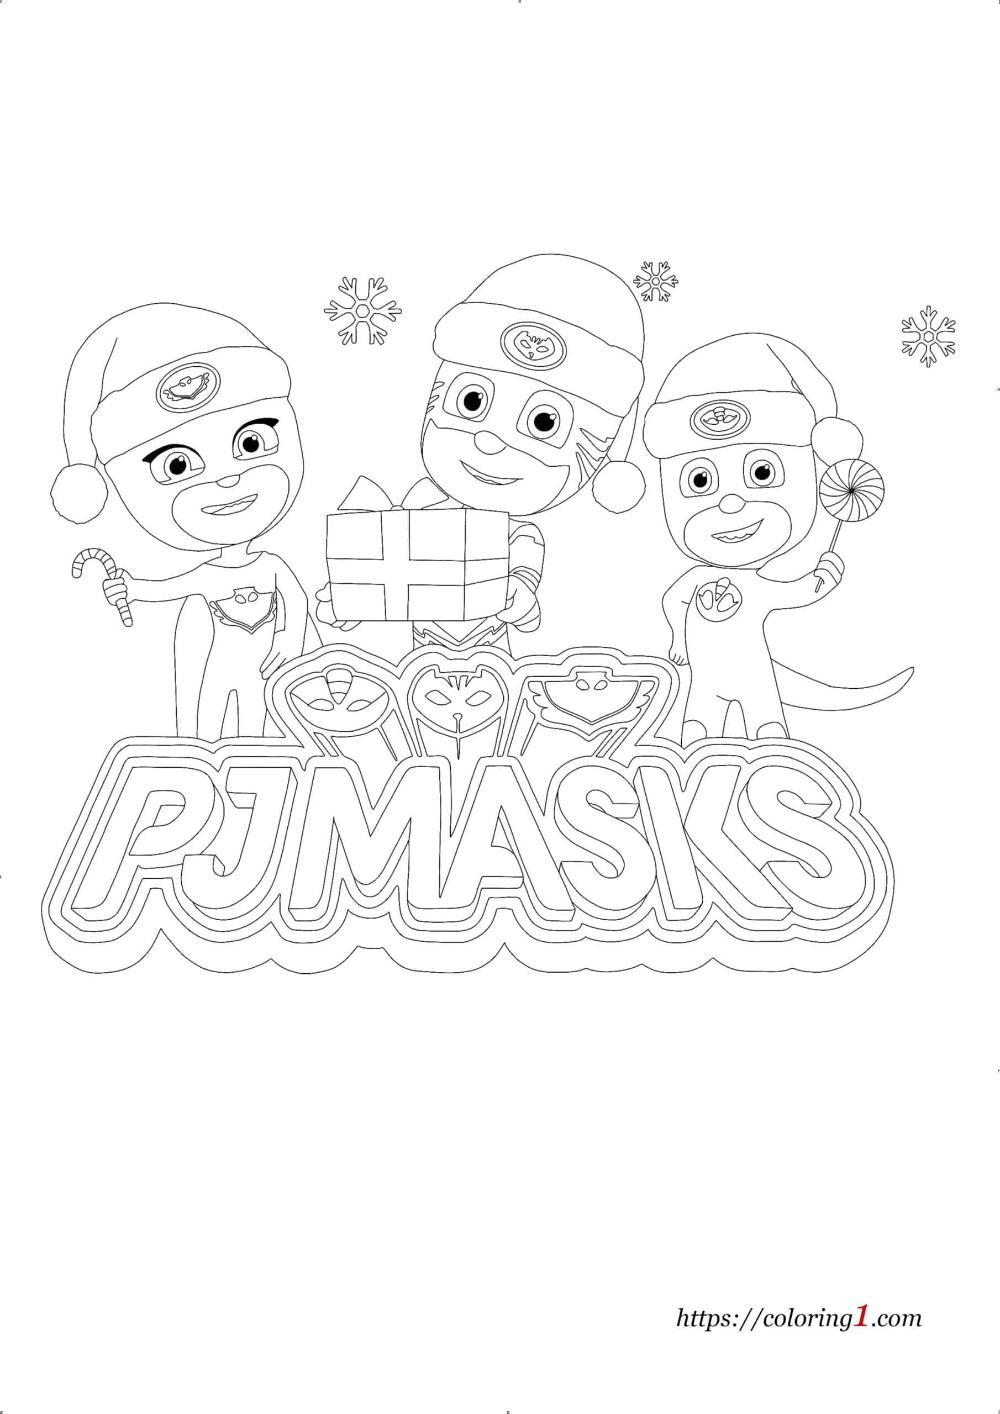 b1e79b2fd039045dfa022c344d09fa70 » Christmas Color Pages Easy To Draw Pj Masks